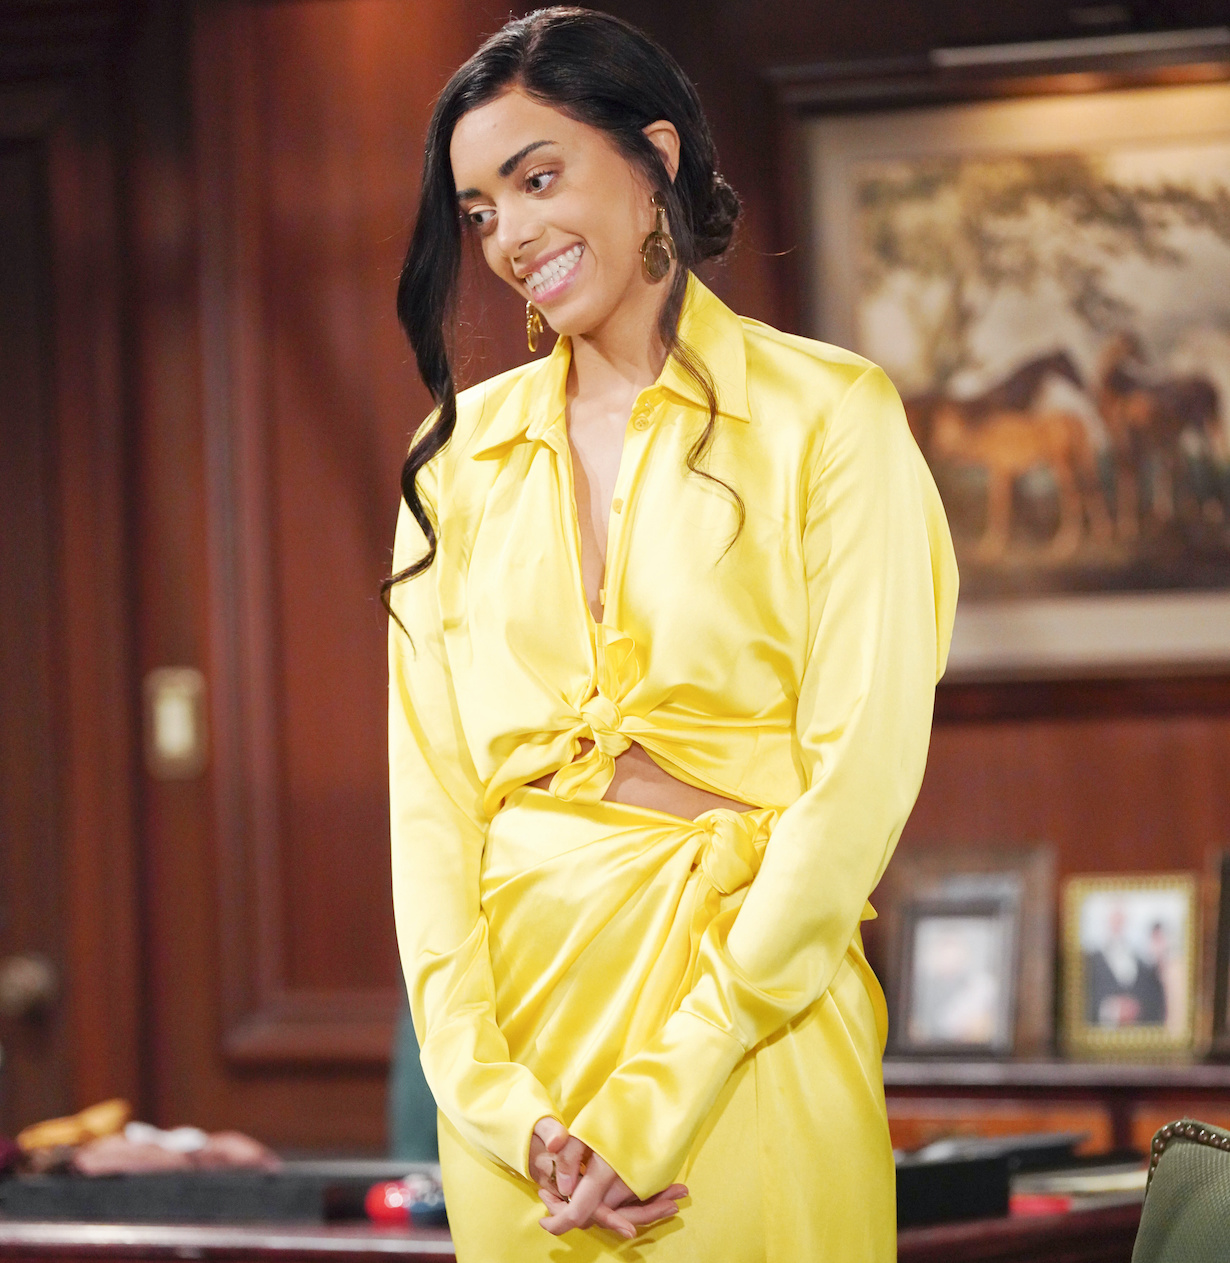 "Kiara Barnes ""The Bold and the Beautiful"" Set CBS Television City Los Angeles, Ca. 02/26/21 © Howard Wise/jpistudios.com 310-657-9661 Episode # 8502 U.S.Airdate 04/23/21"